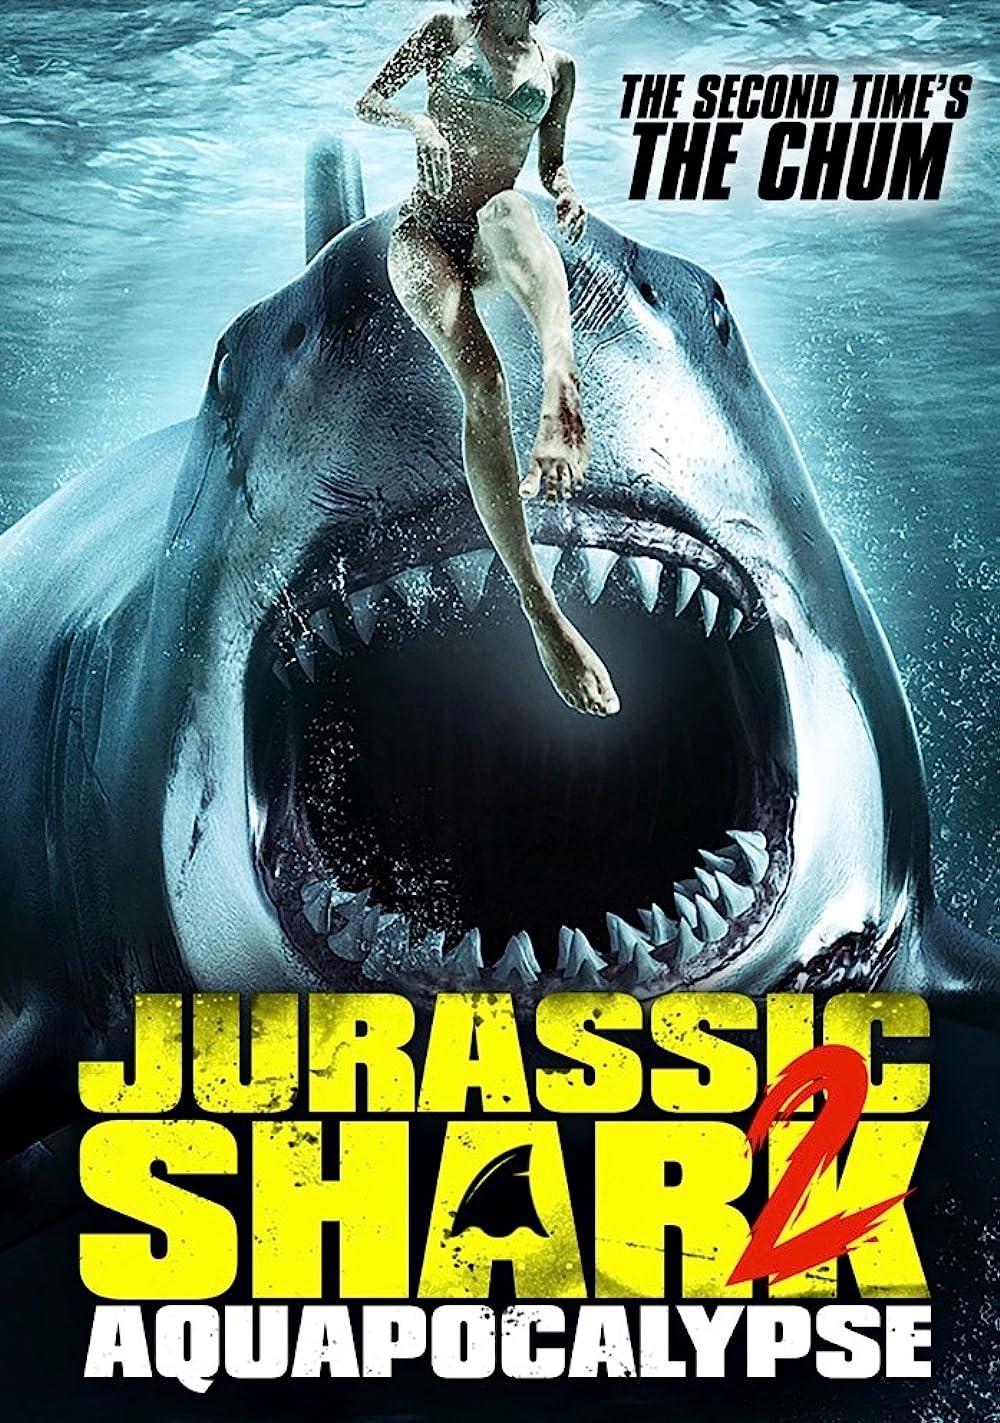 Jurassic Shark 2 Aquapocalypse 2021 English 480p AMZN HDRip ESub 223MB Download